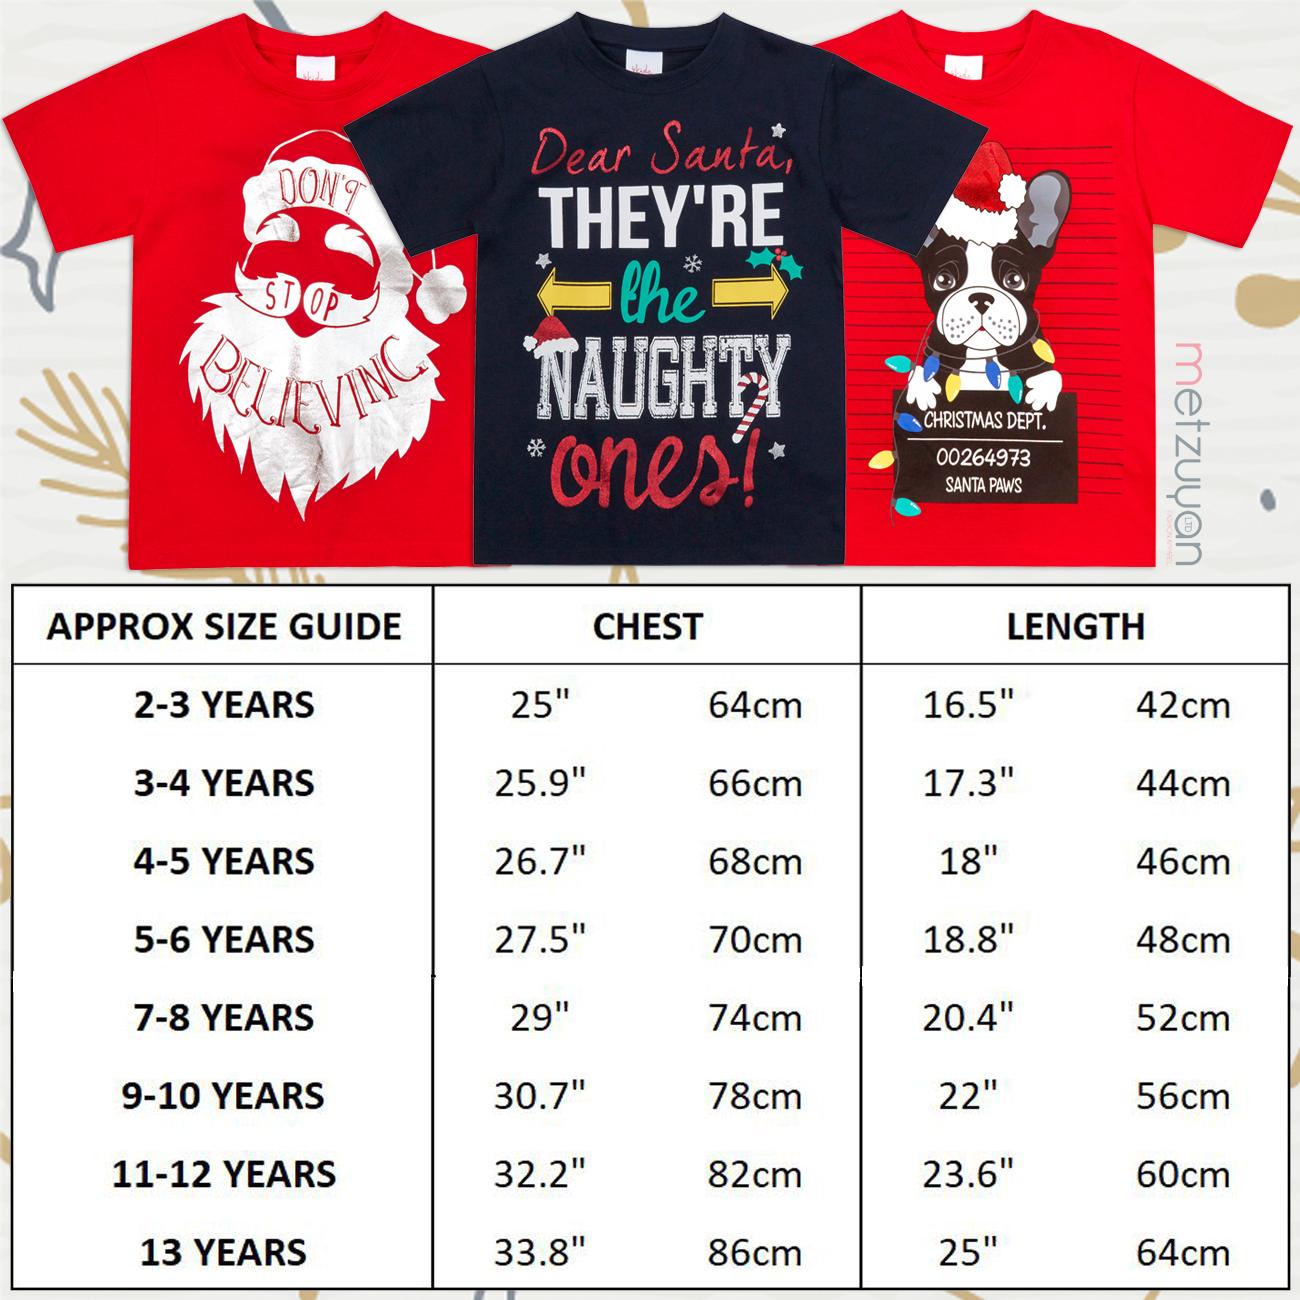 Childrens-Girls-Boys-Xmas-T-Shirts-Printed-Christmas-Design-100-Cotton-2-13-Yrs thumbnail 35